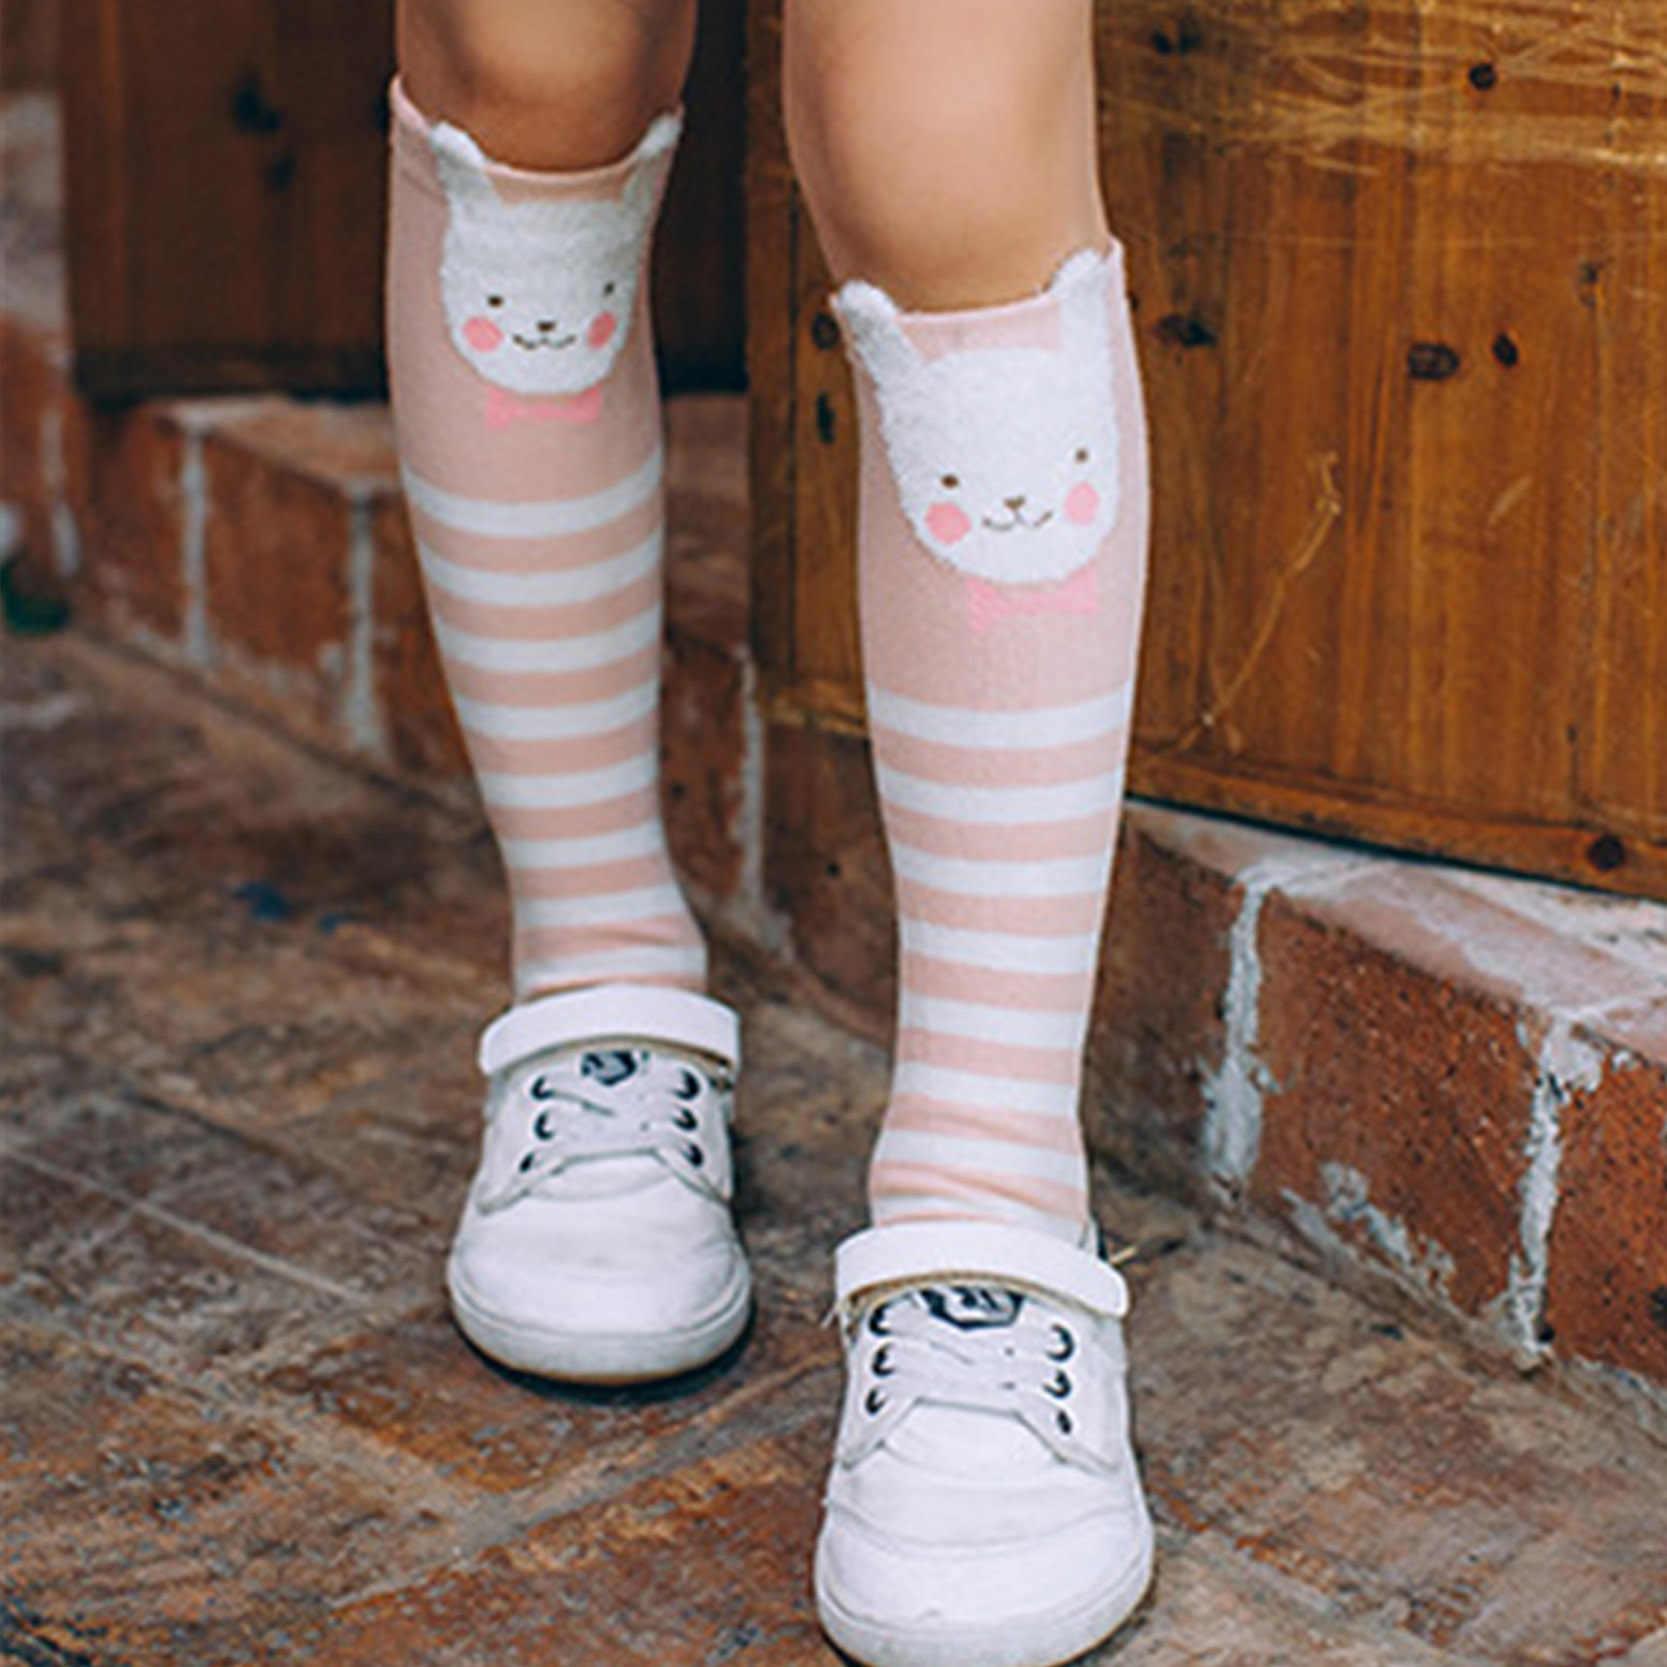 85a0a4f5b Detail Feedback Questions about Cotton Knee High Socks For Kids Girl Cute Panda  Cat Fox Cartoon Long Socks Children Winter Boot Socks on Aliexpress.com ...